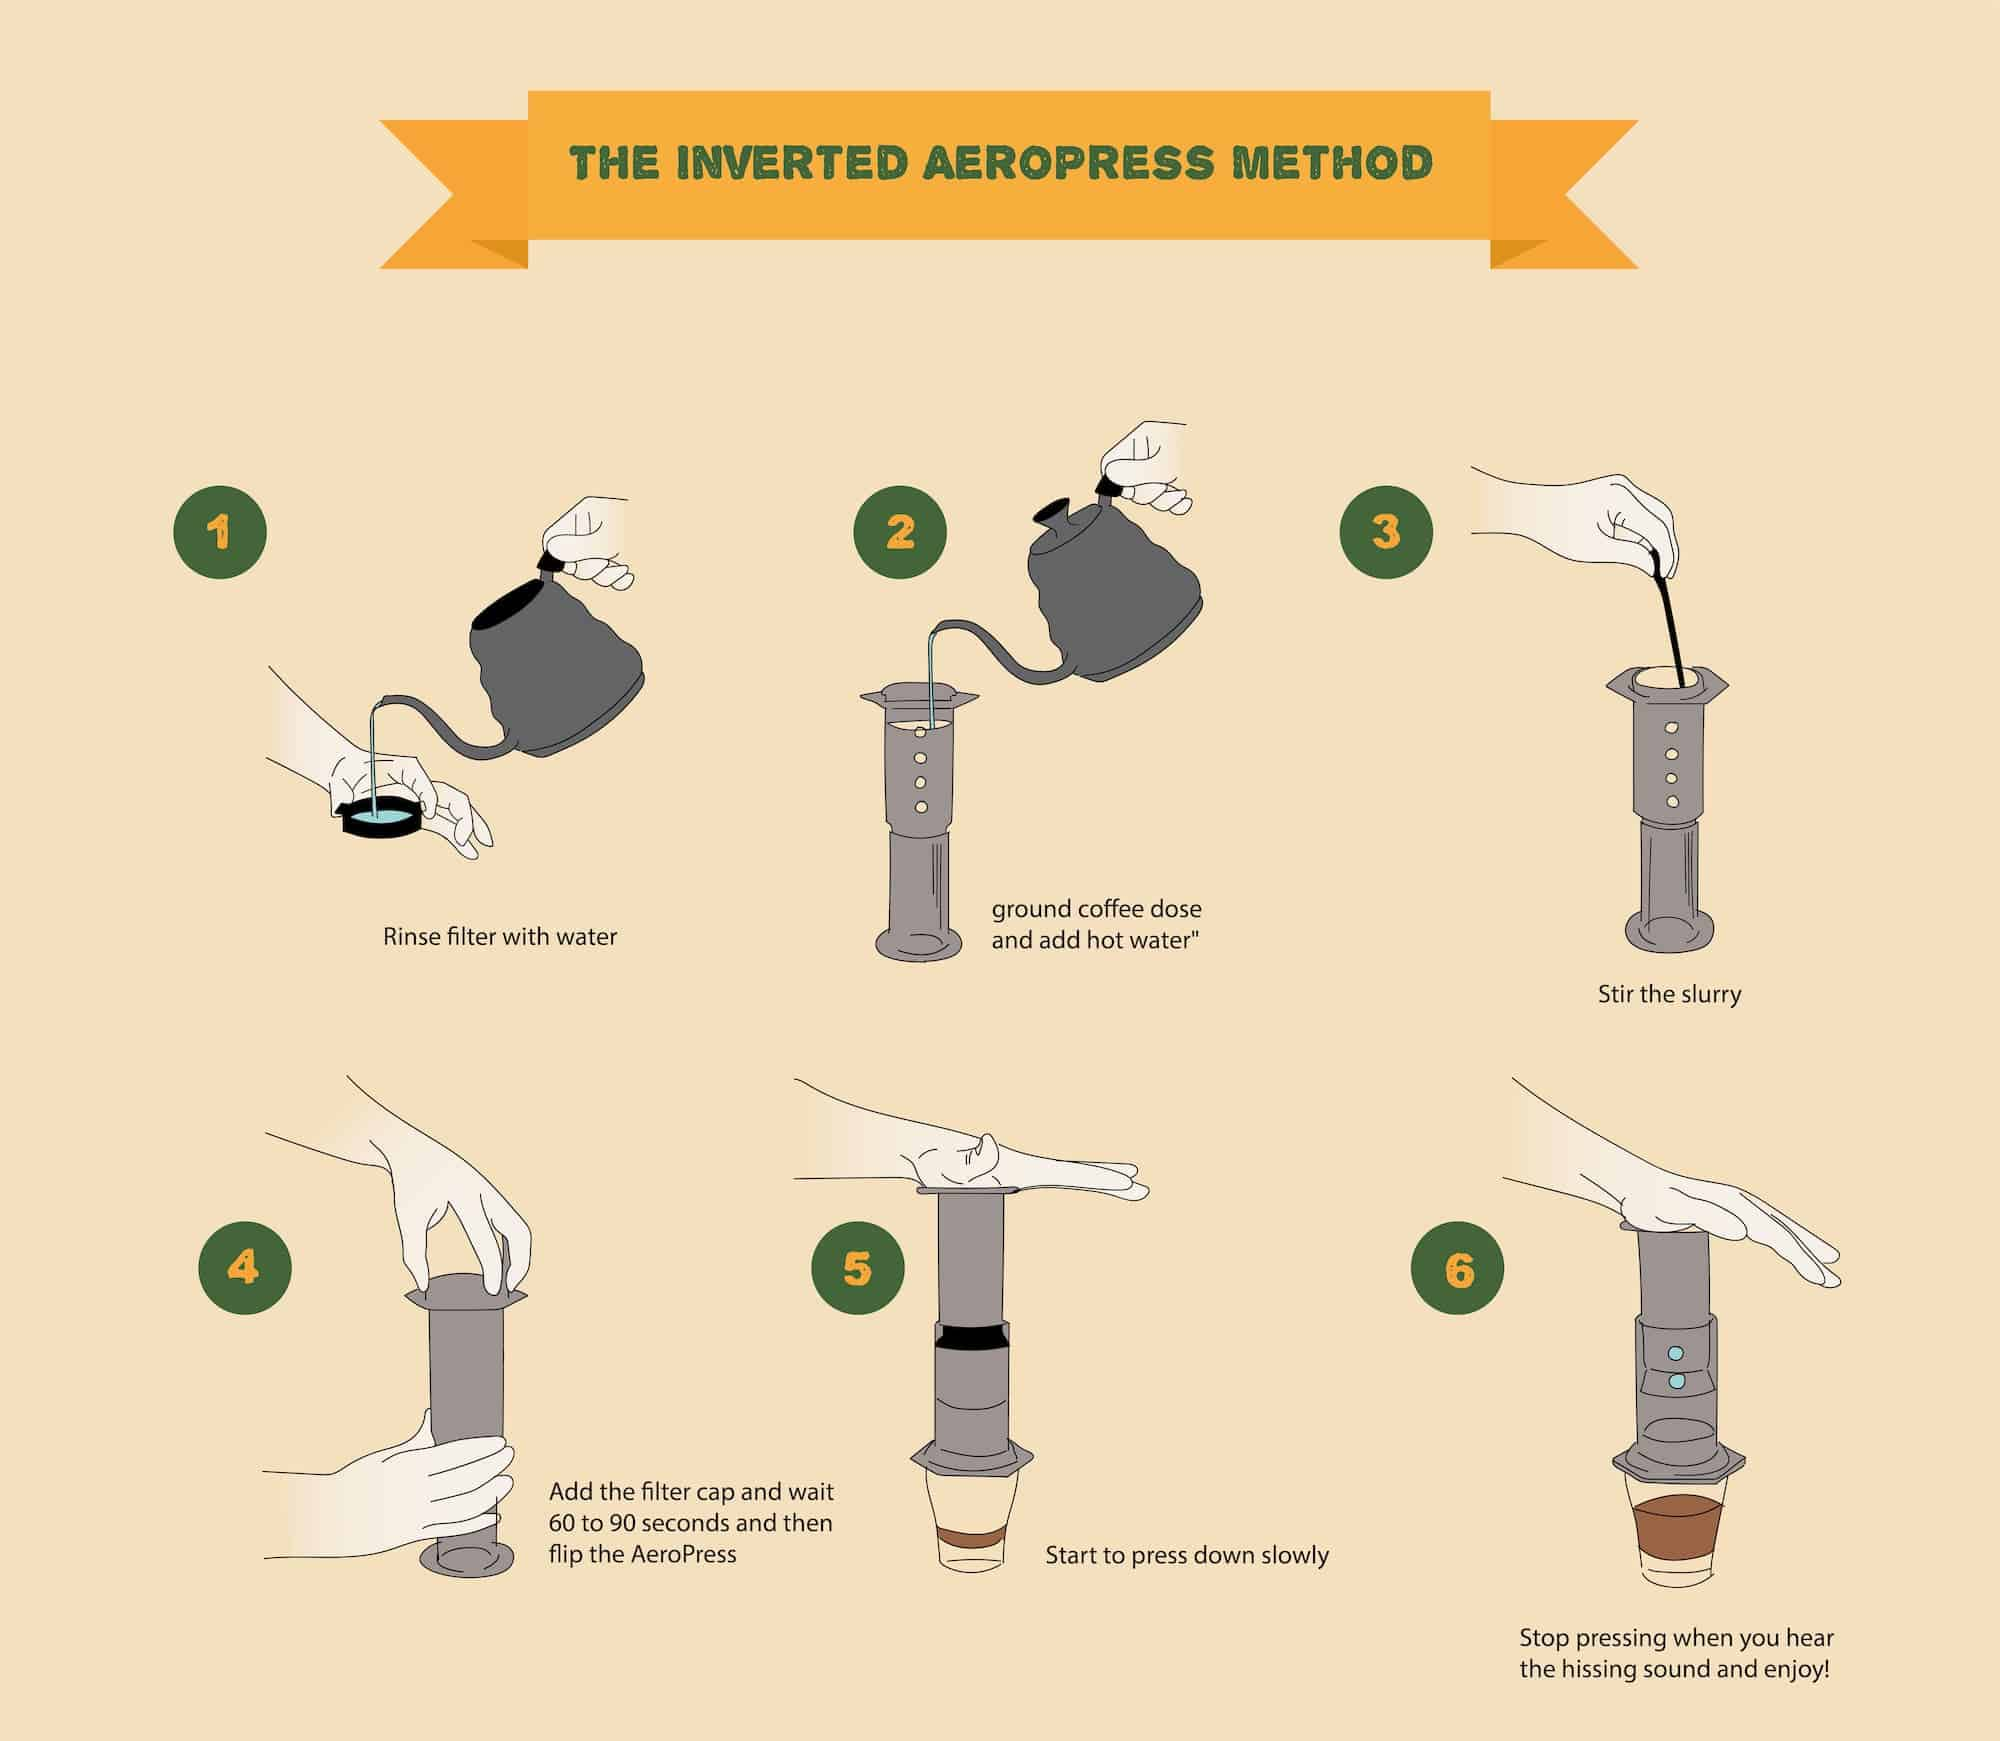 Inverted AeroPress